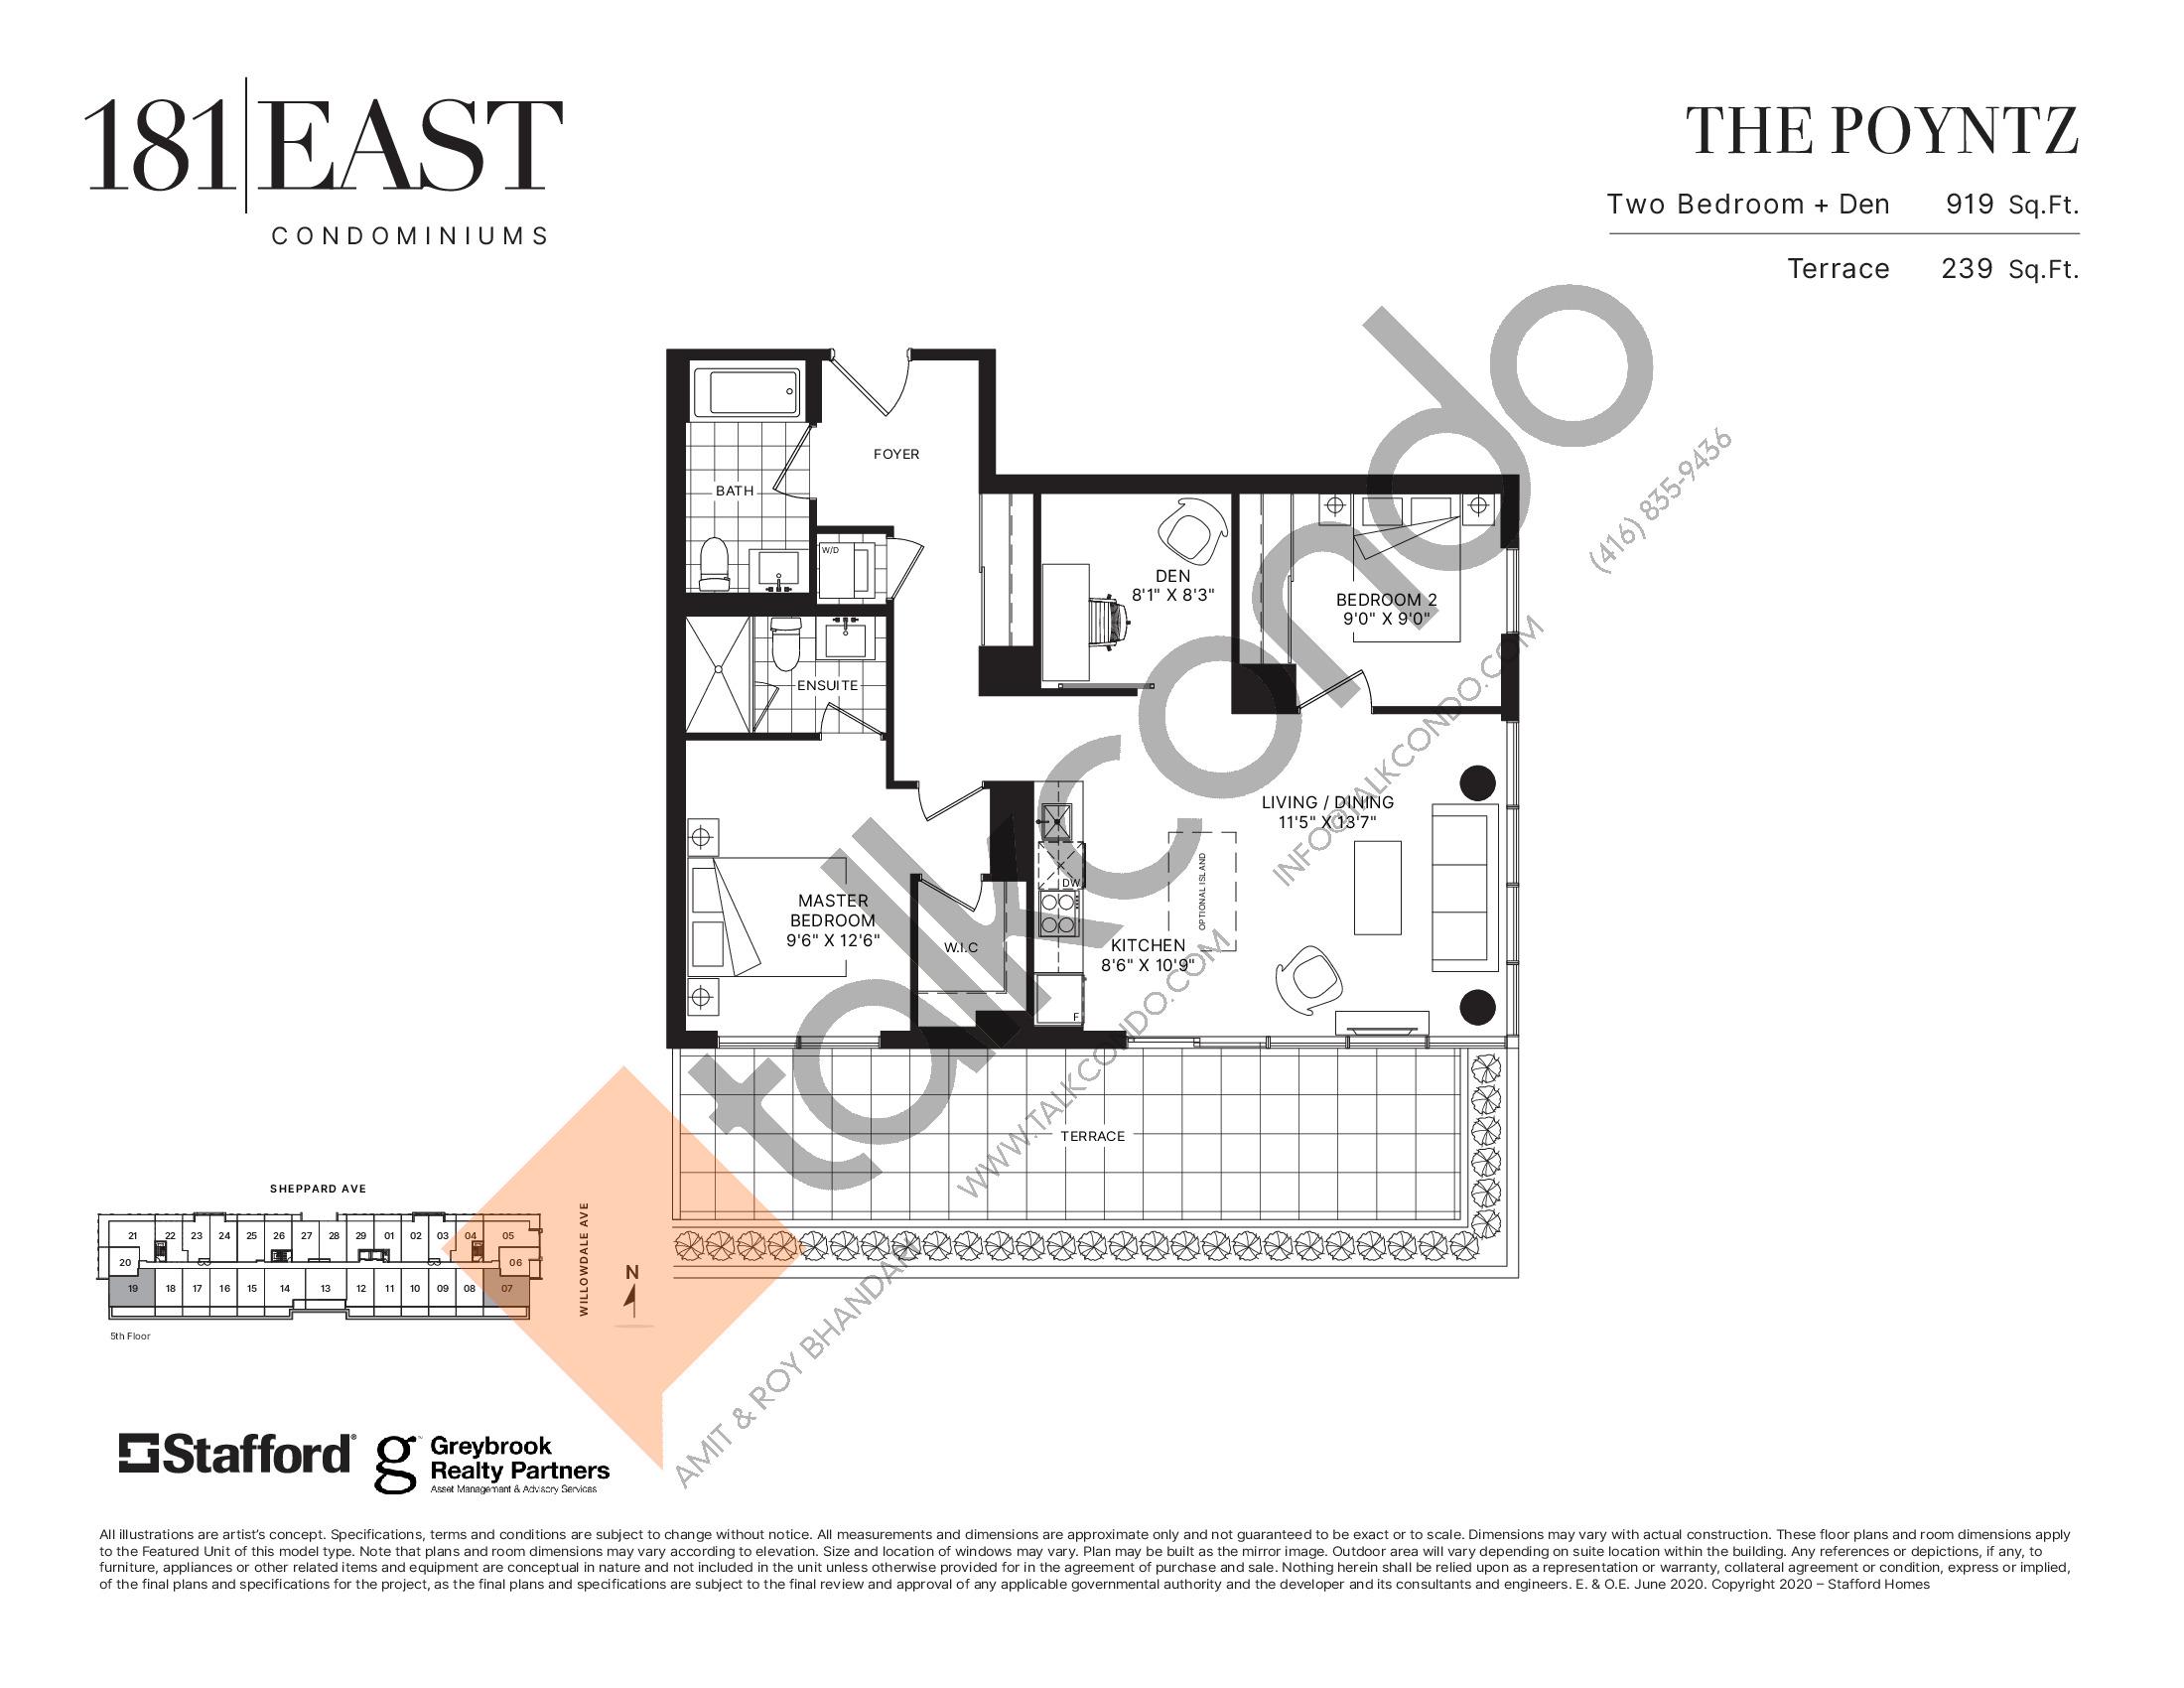 The Poyntz Floor Plan at 181 East Condos - 919 sq.ft